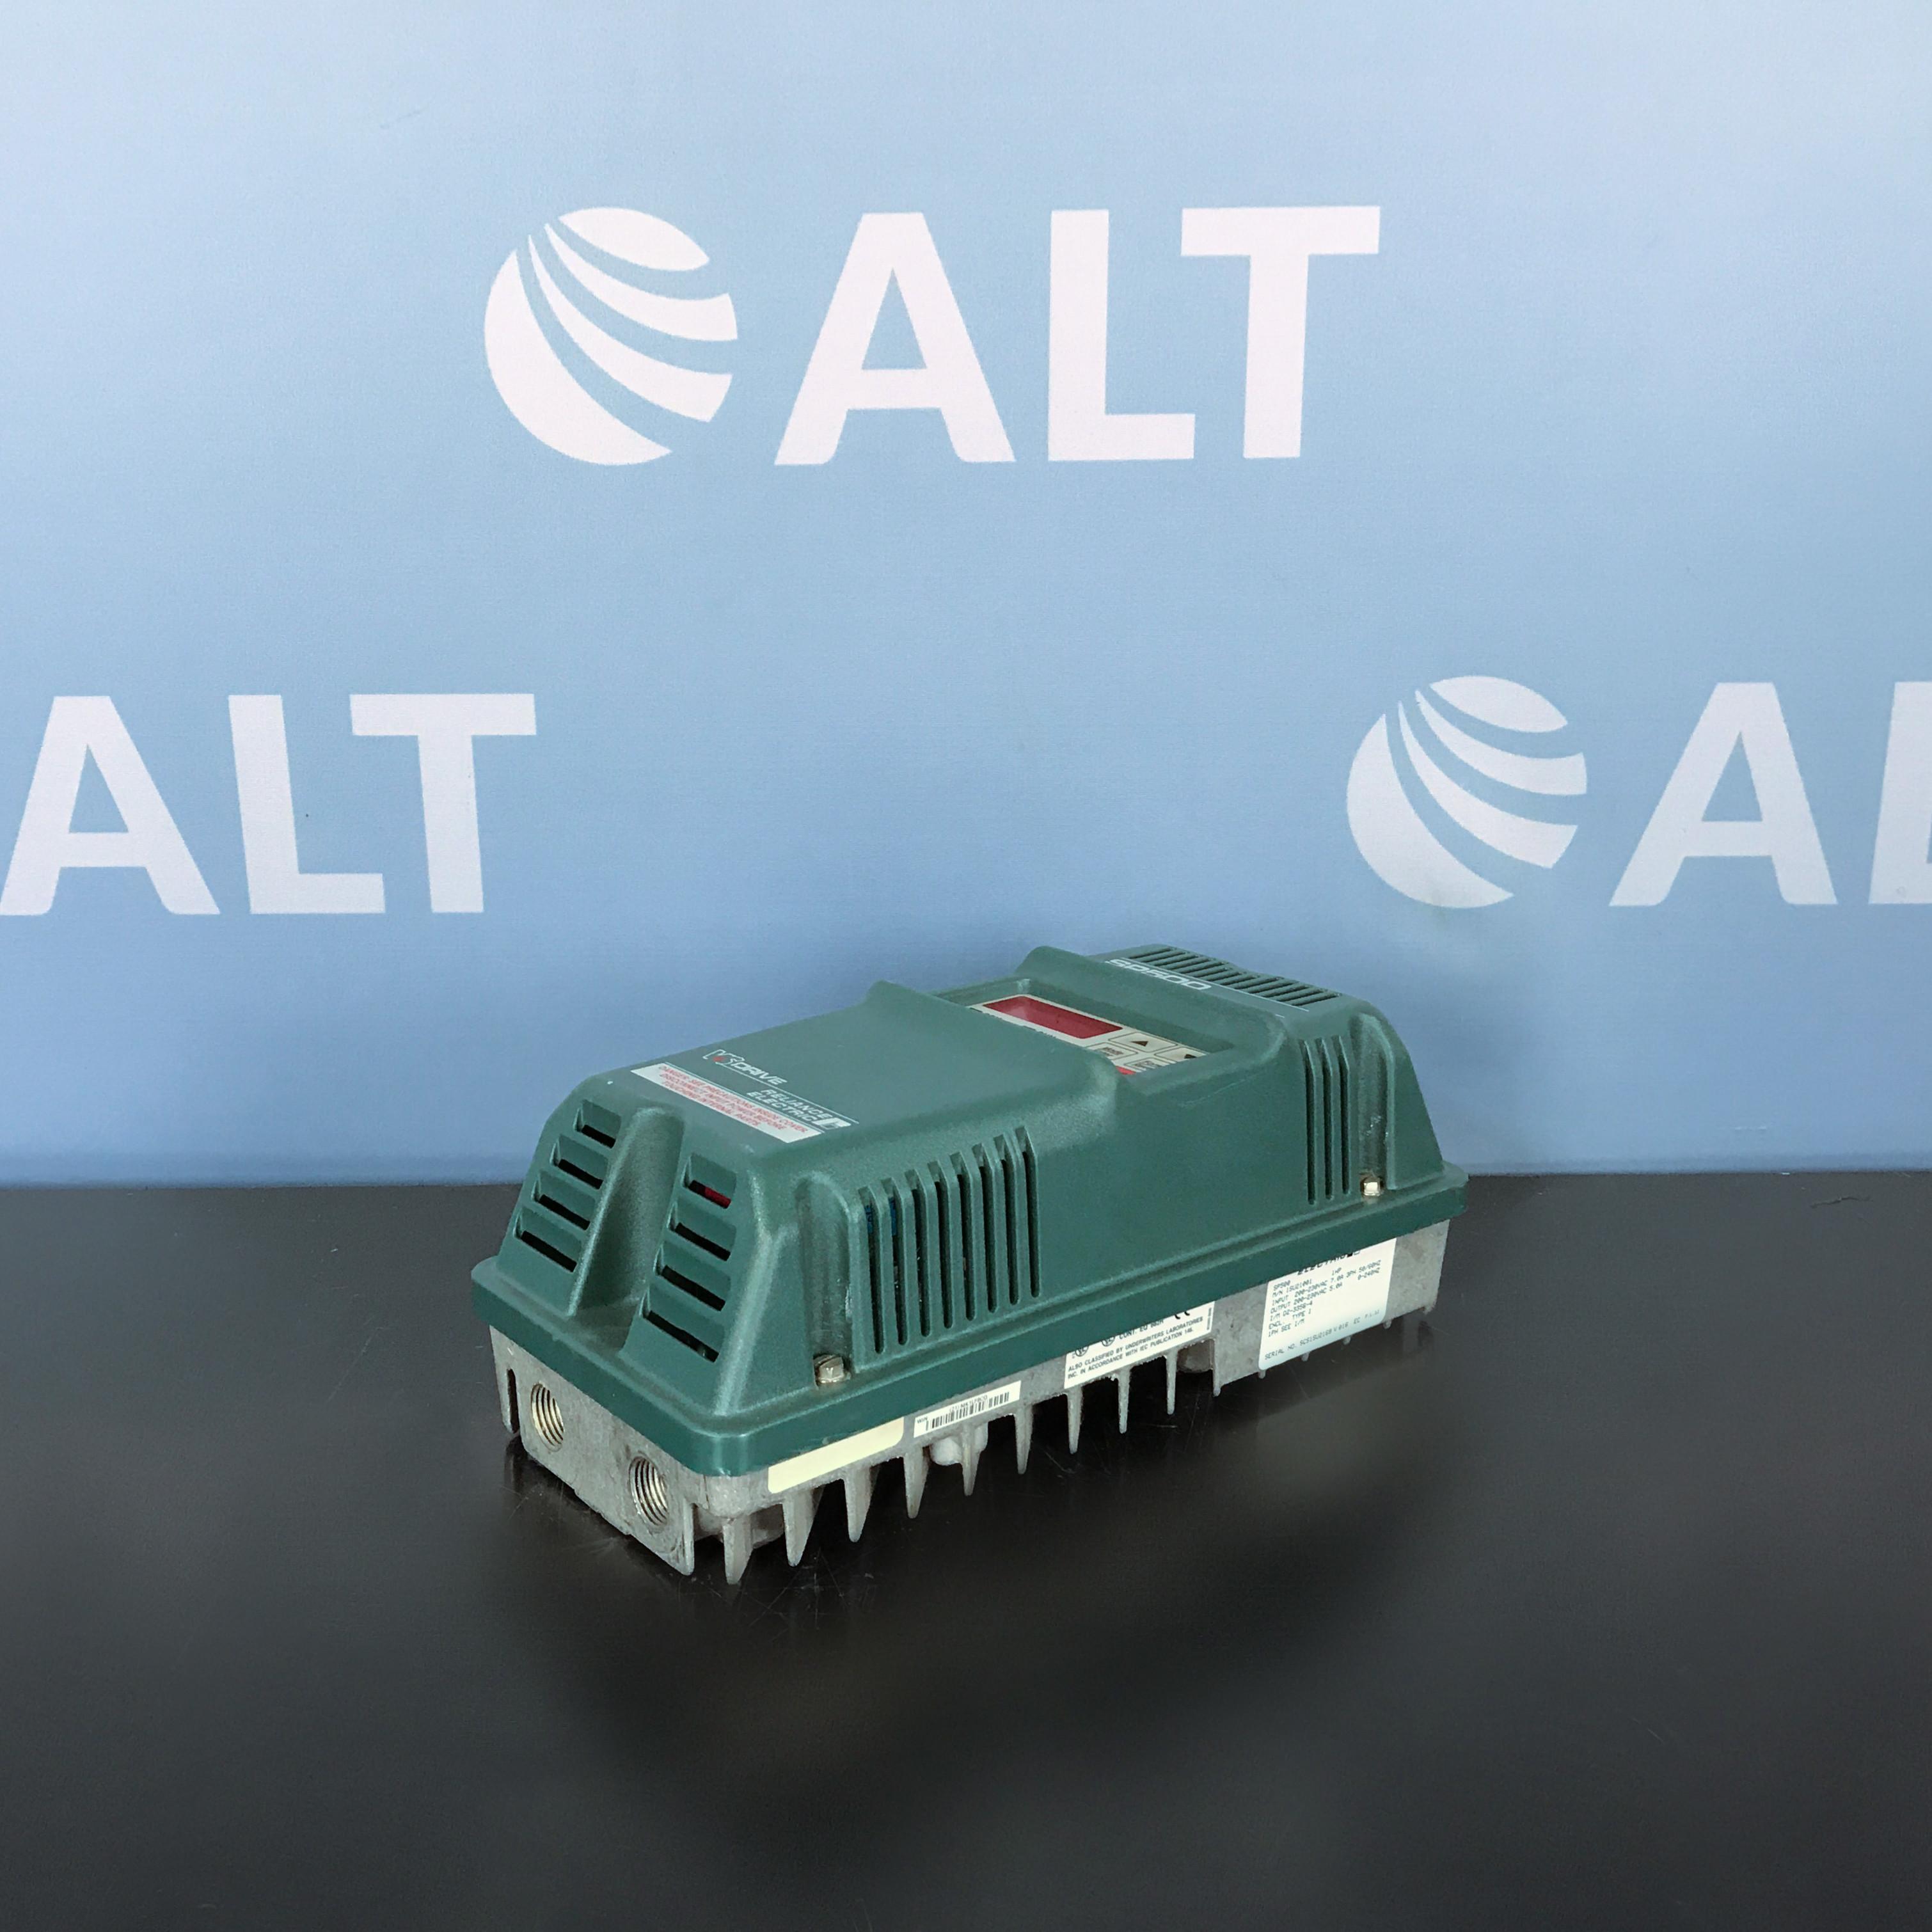 Reliance Electric SP500 1 HP 1SU21001 VFD Motor Speed Drive Image